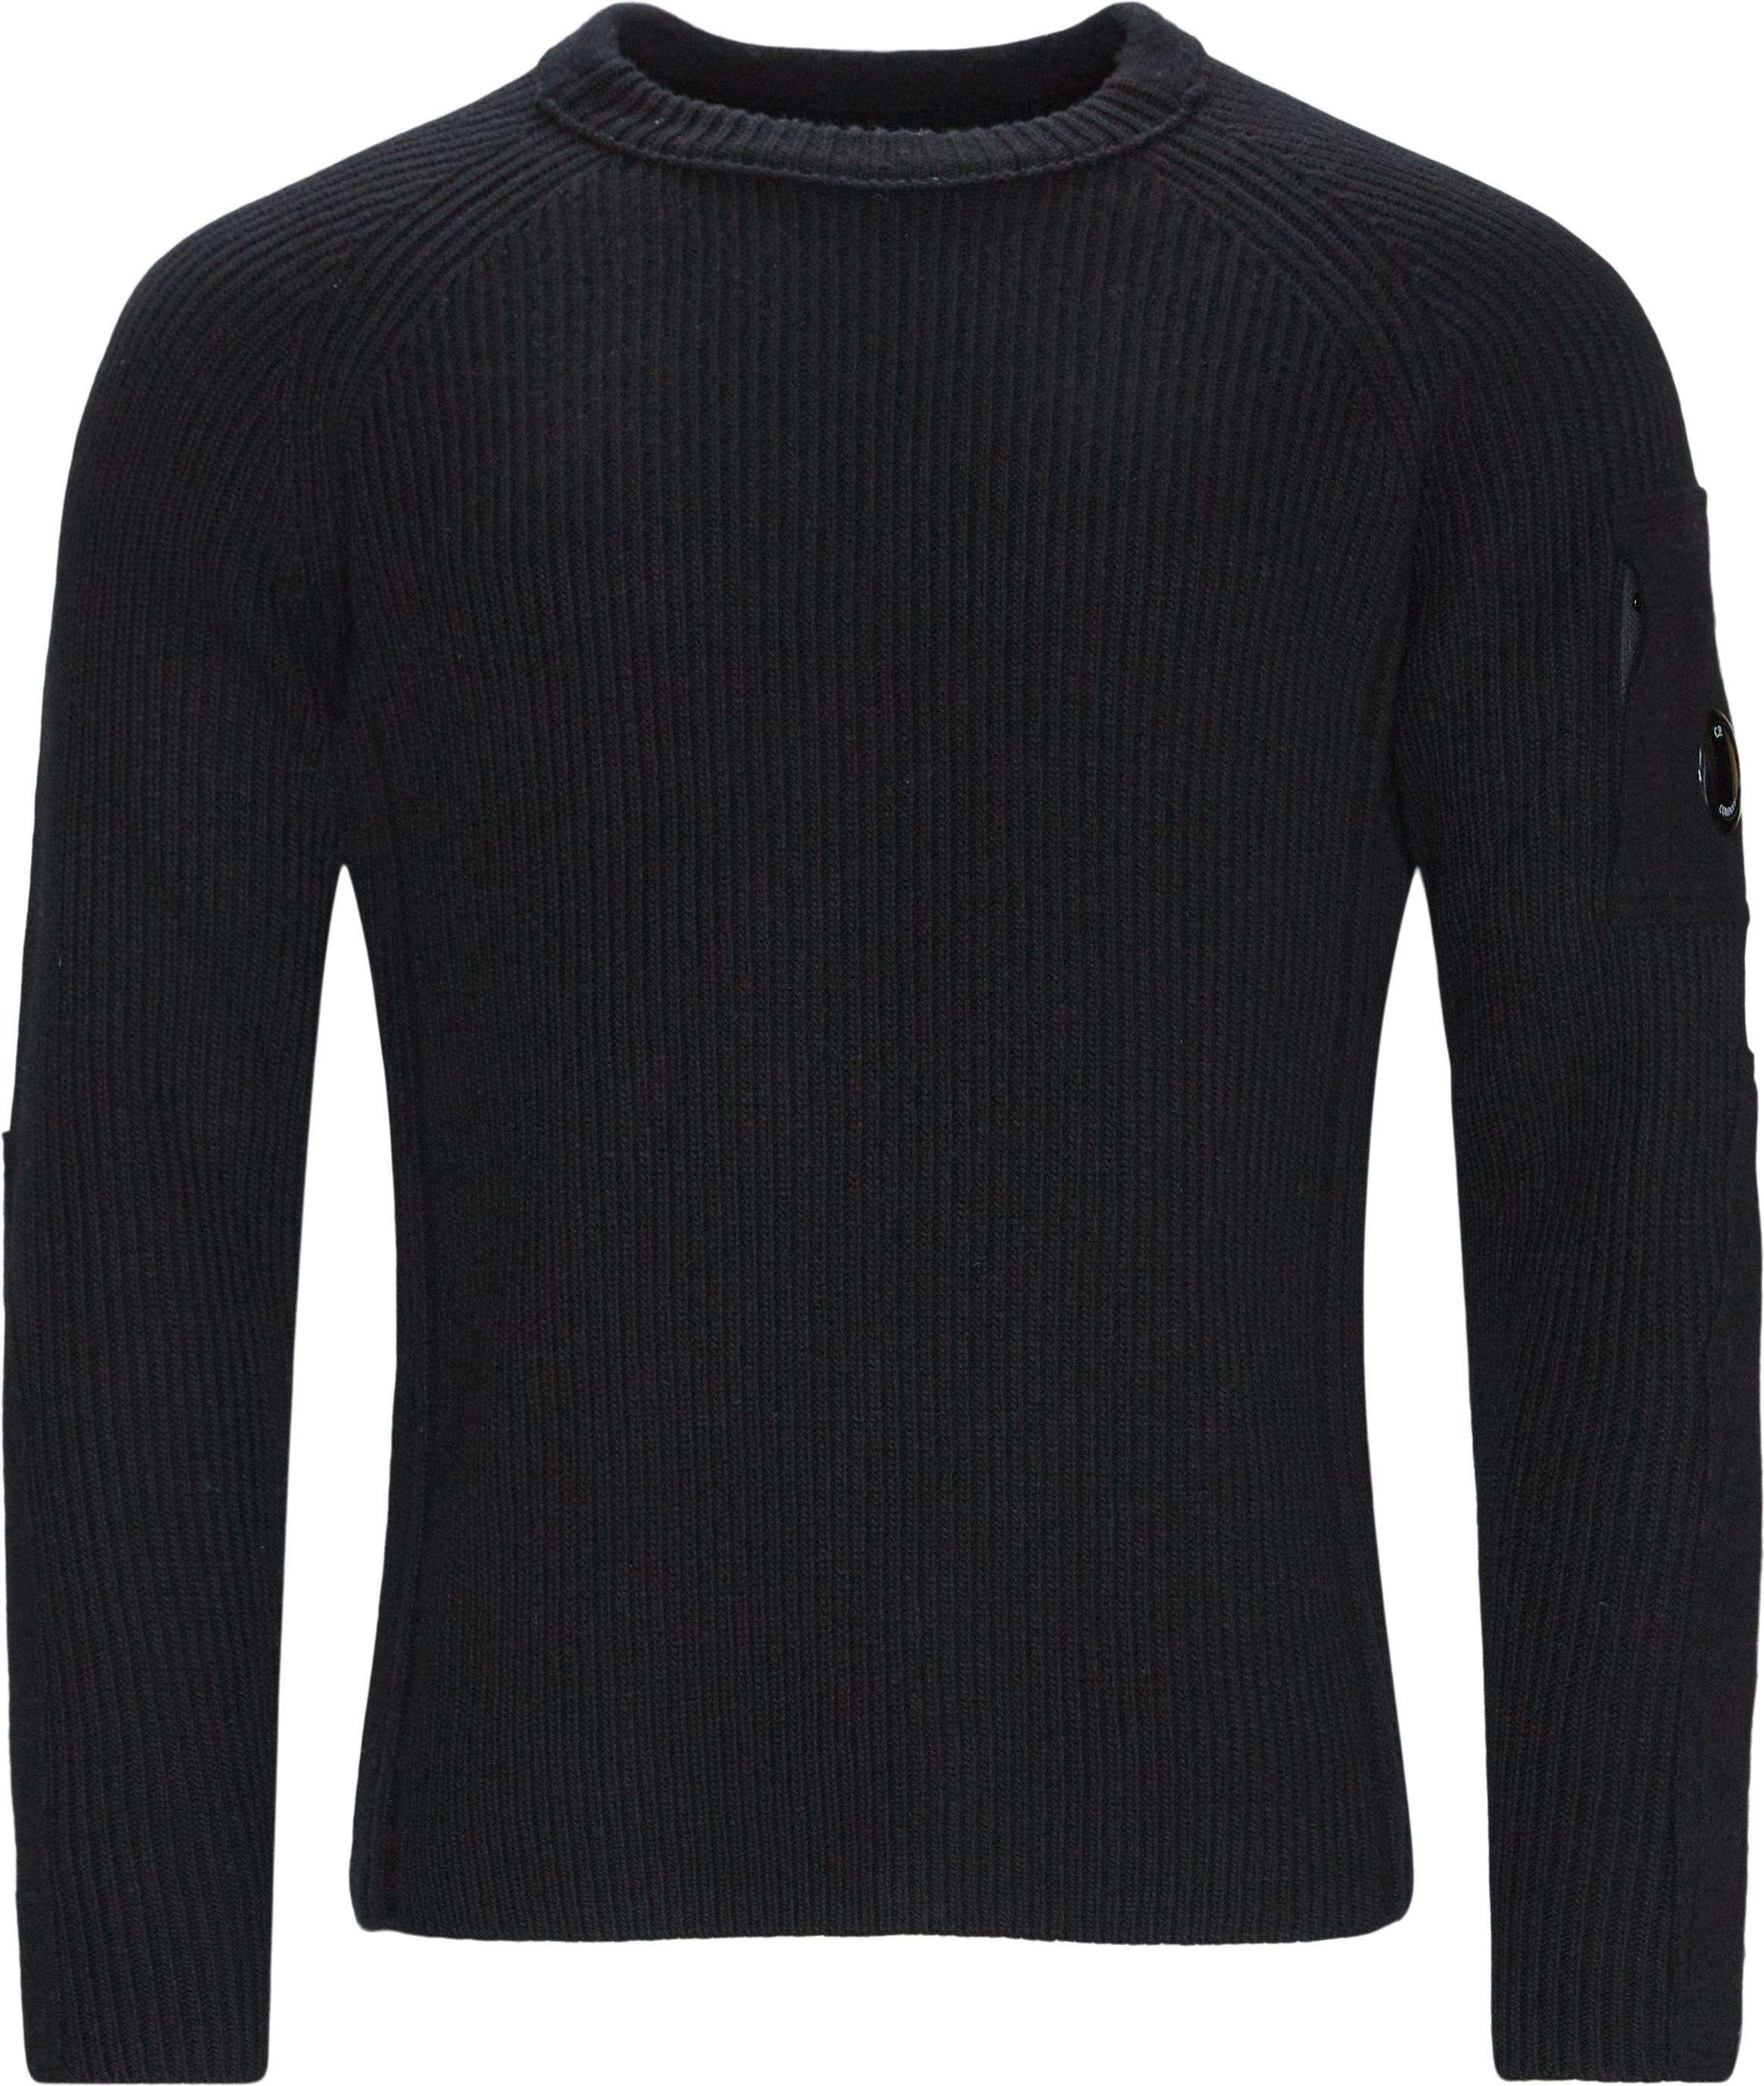 Knitted Sweatshirt - Strik - Regular fit - Sort